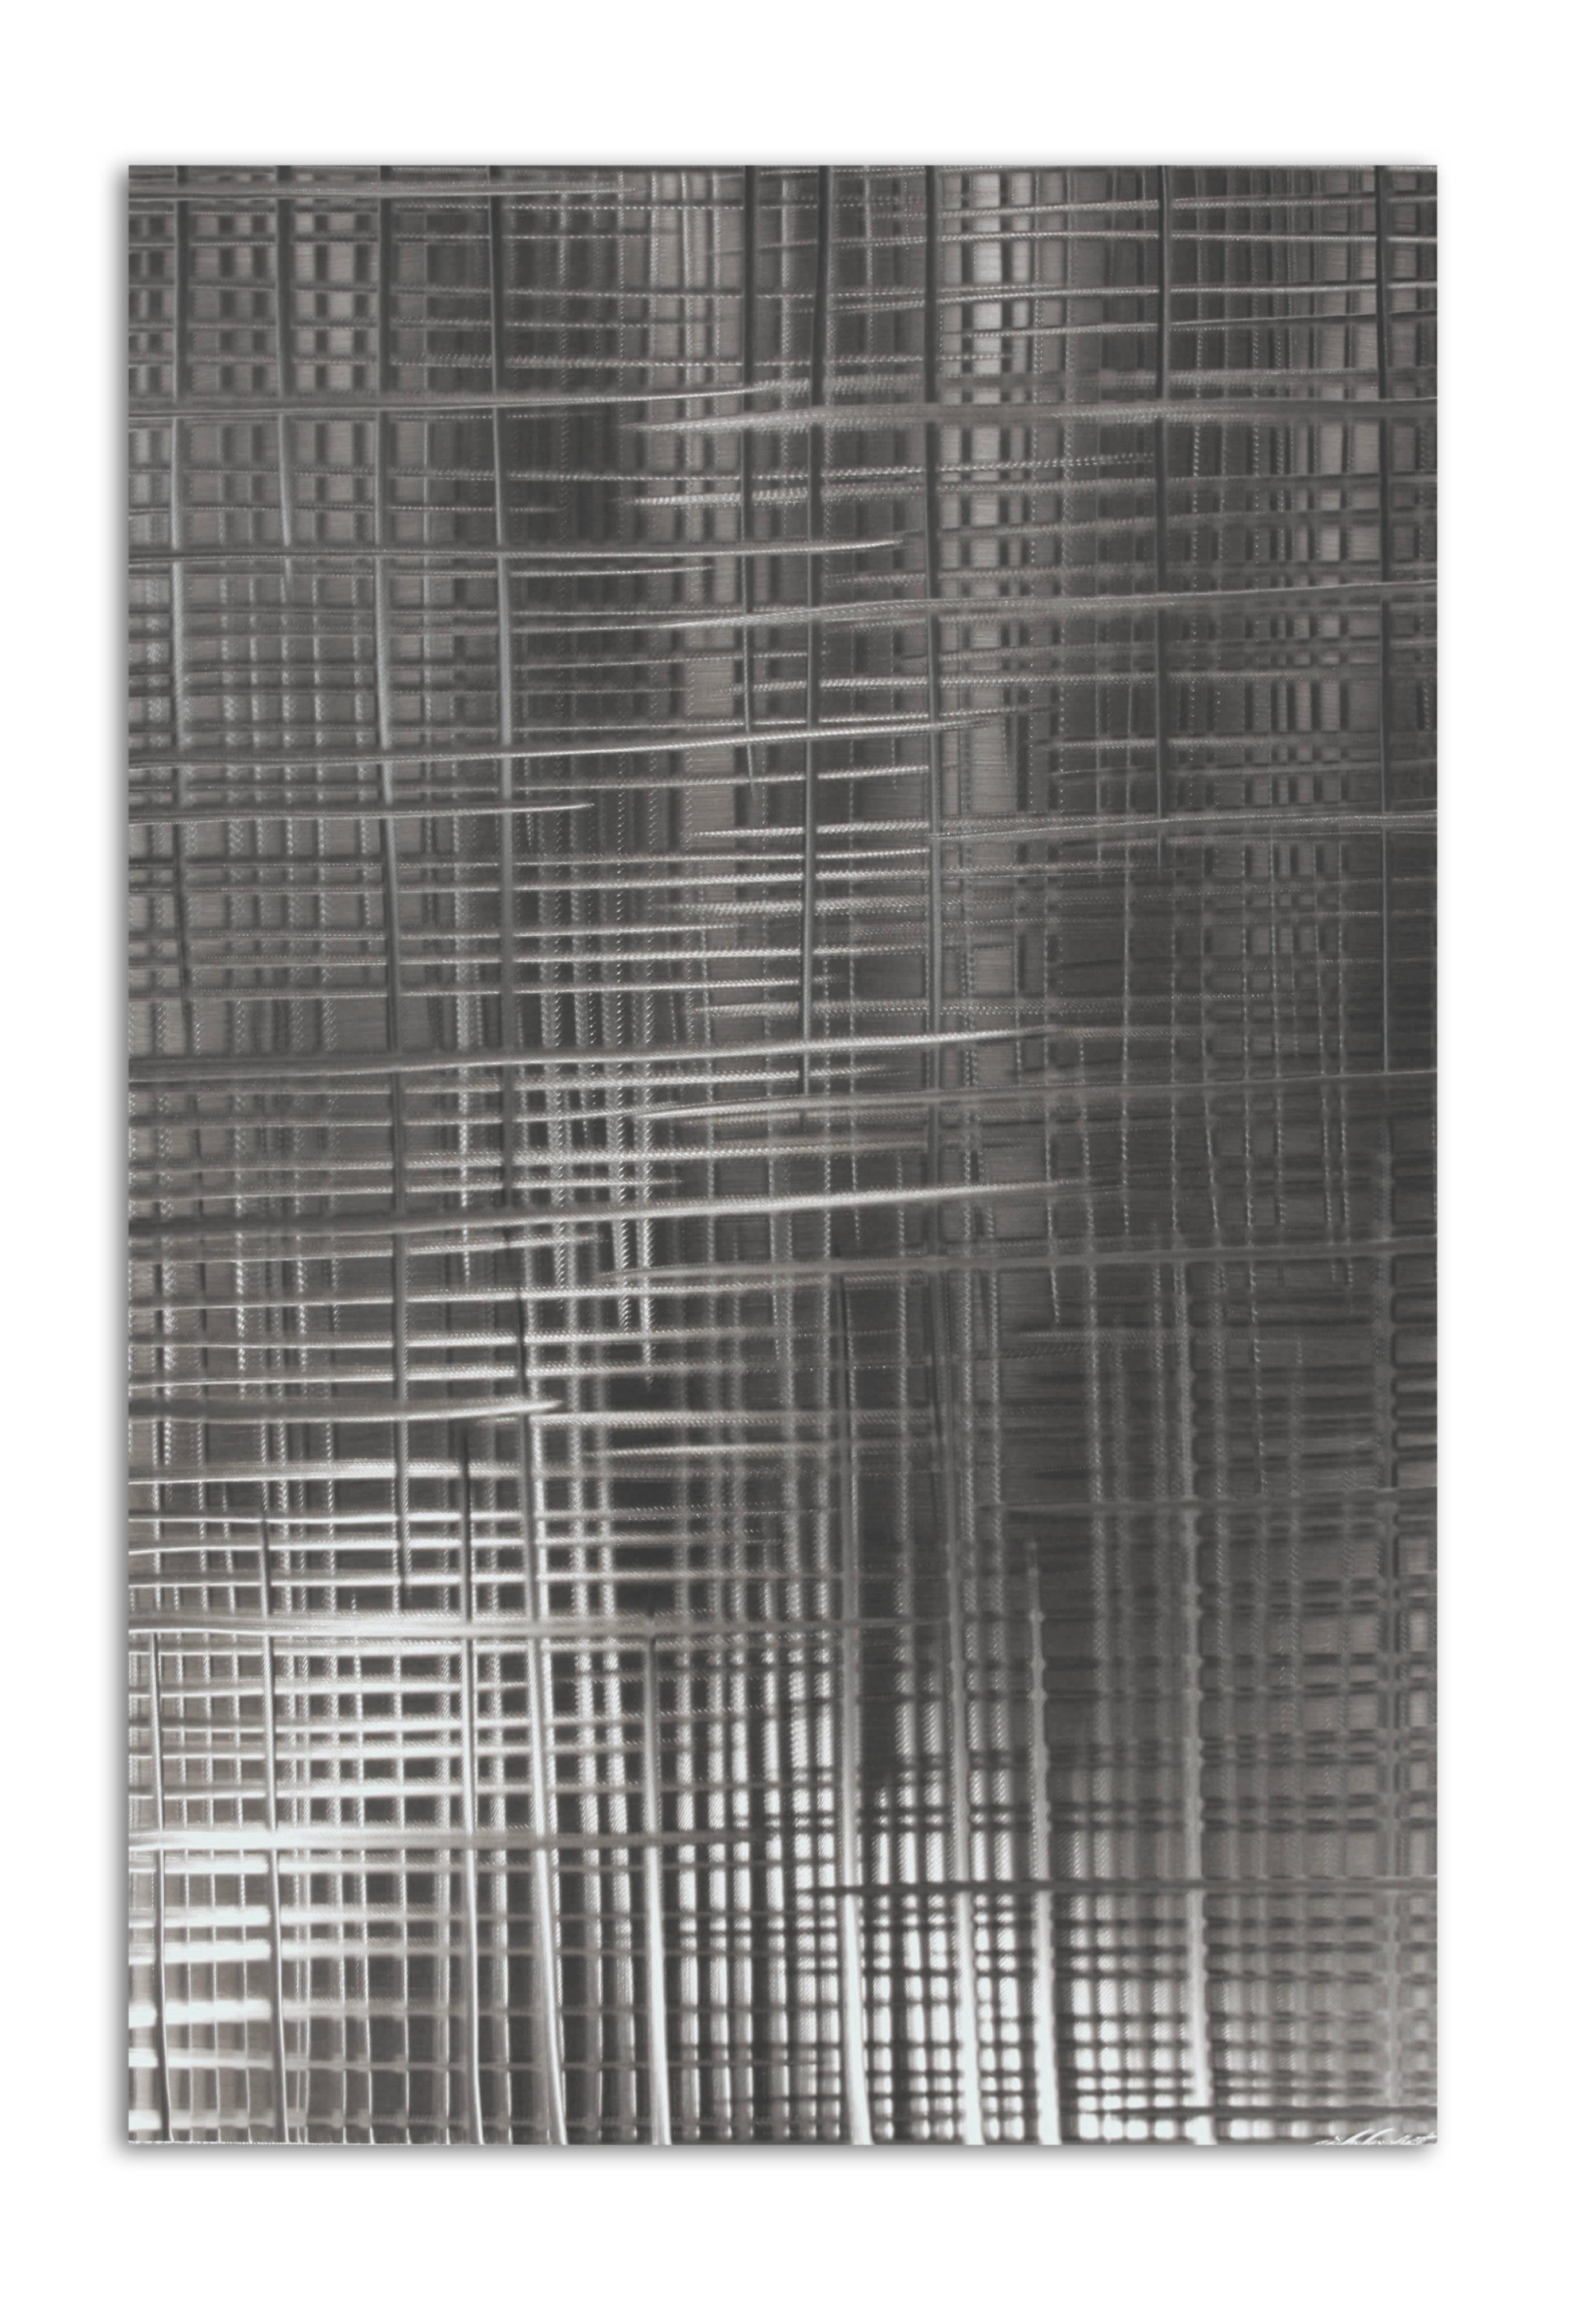 NY0657M - Metal Art by Nicholas Yust, Alternate Angle 1